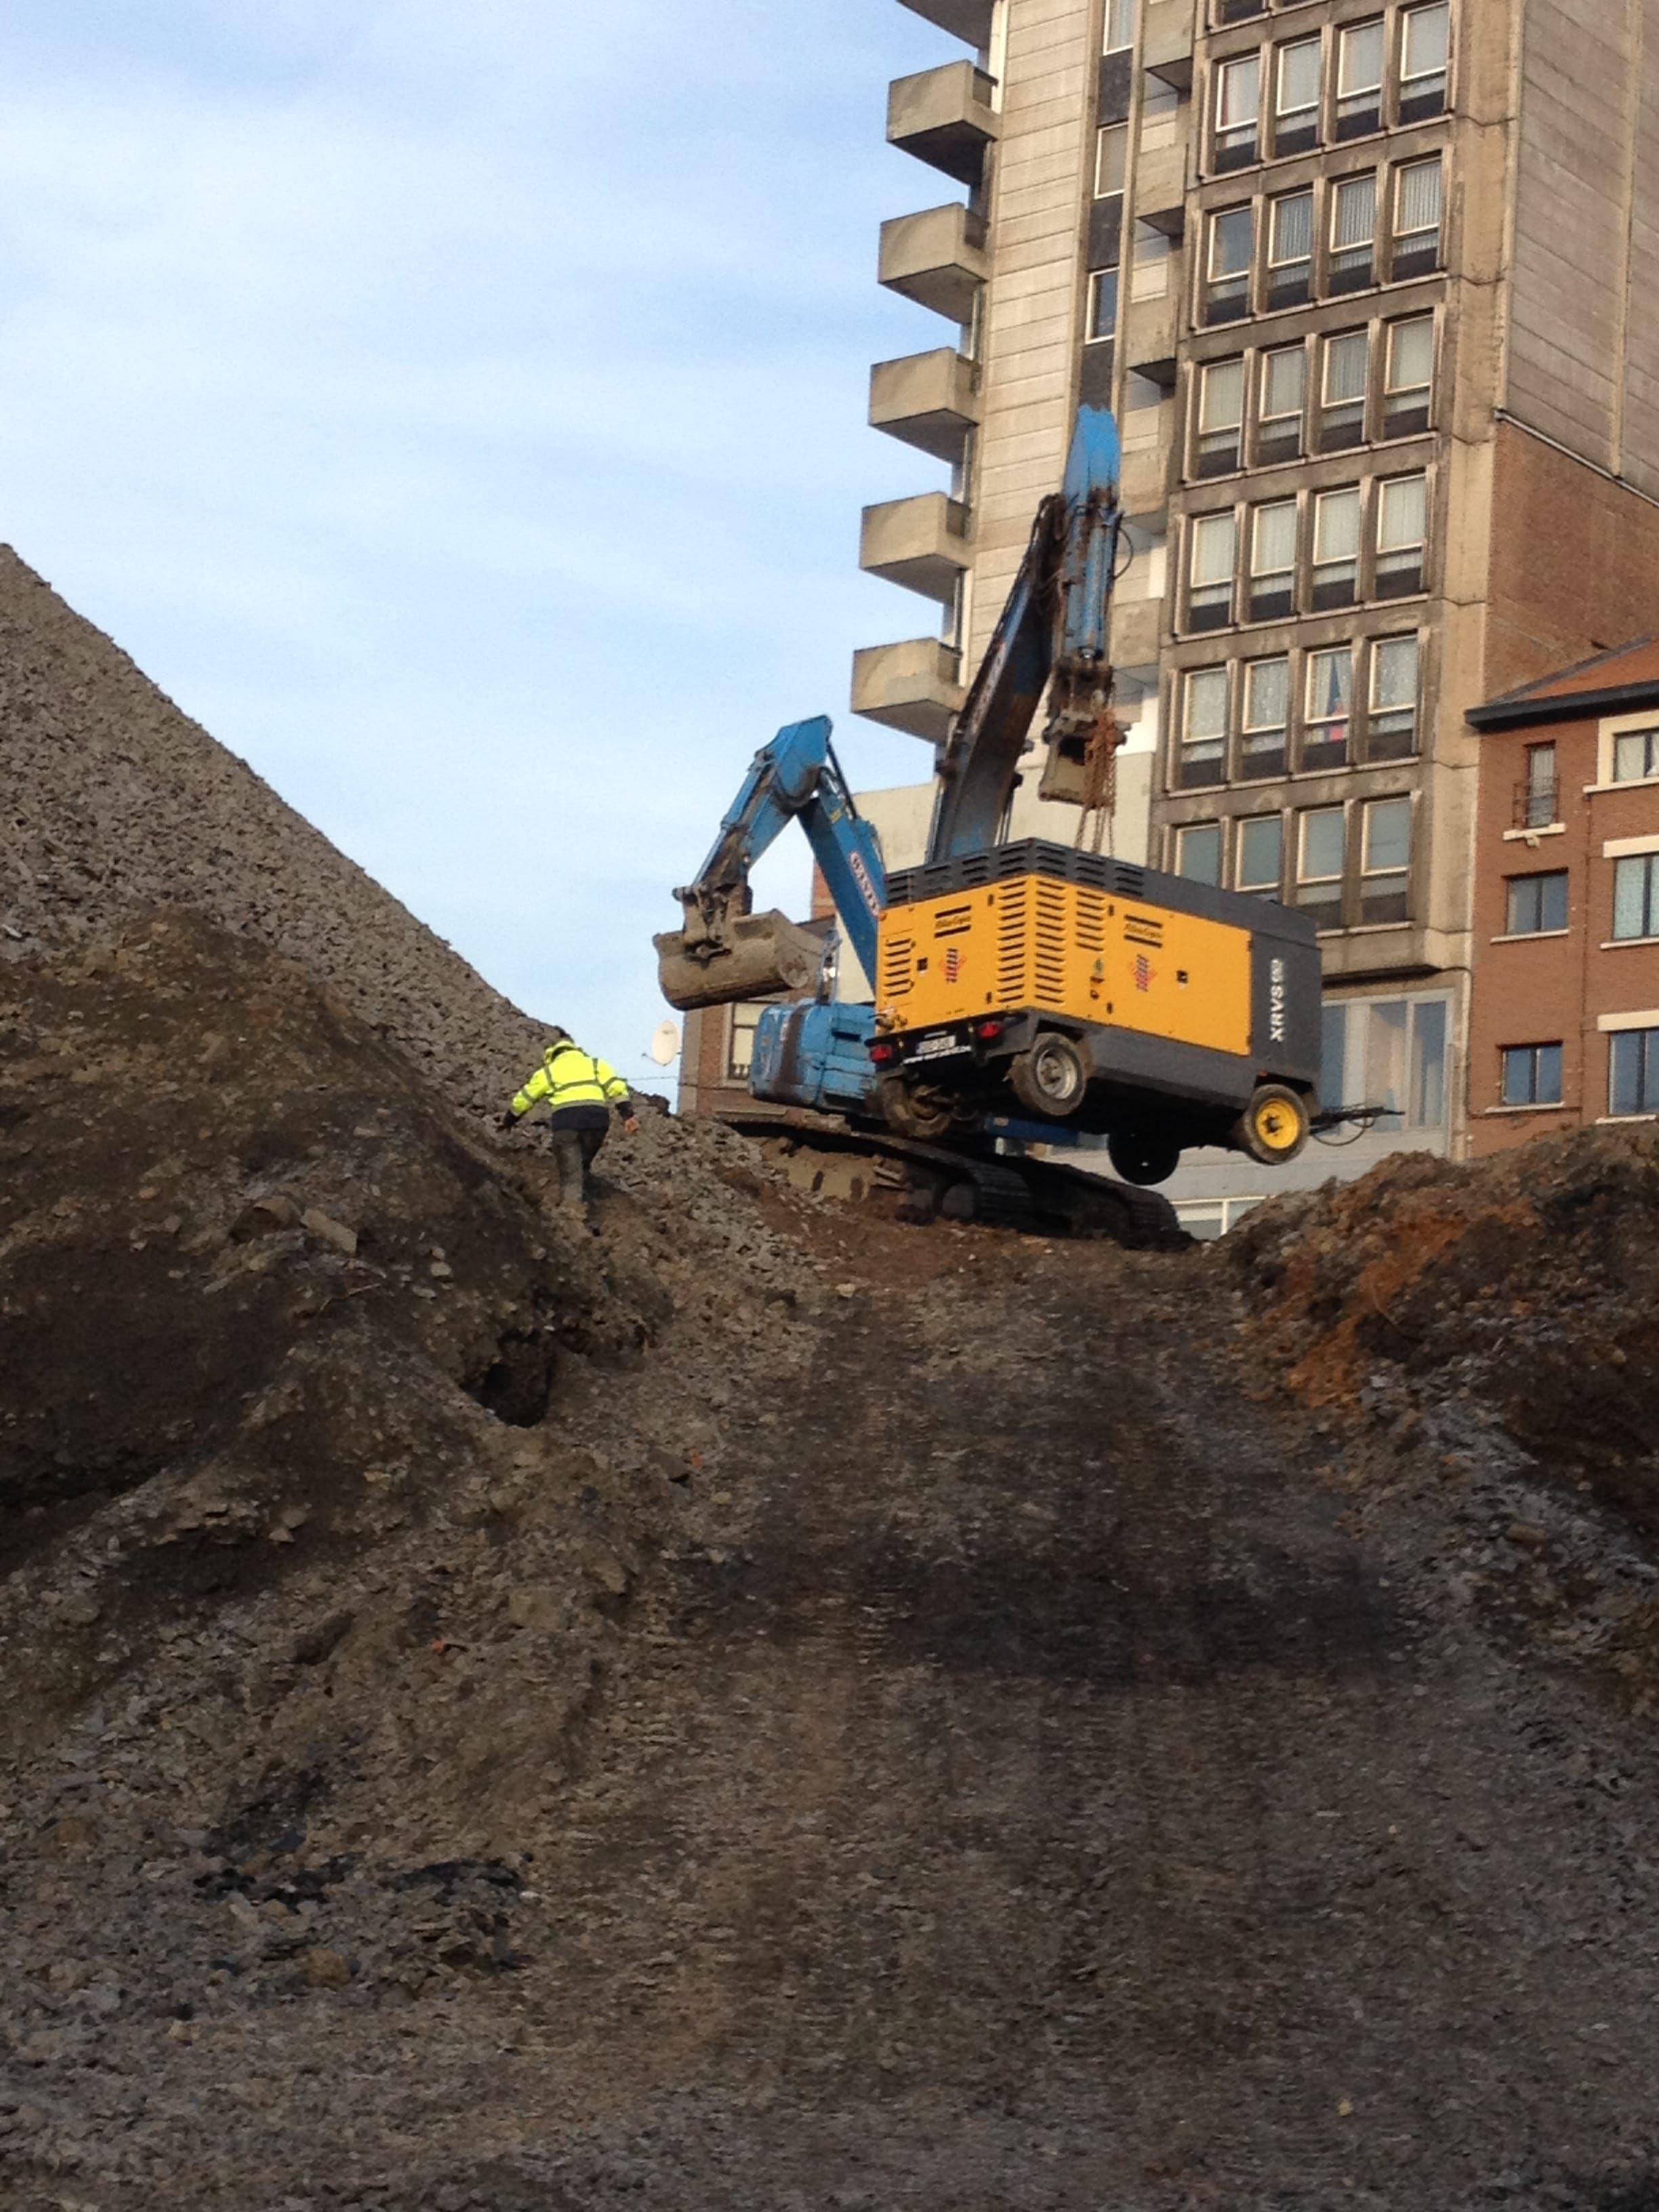 chantier-charleroi-rive-gauche-forage-installation-pompe-puits-geothermie-eurodrill-liege-belgique-3